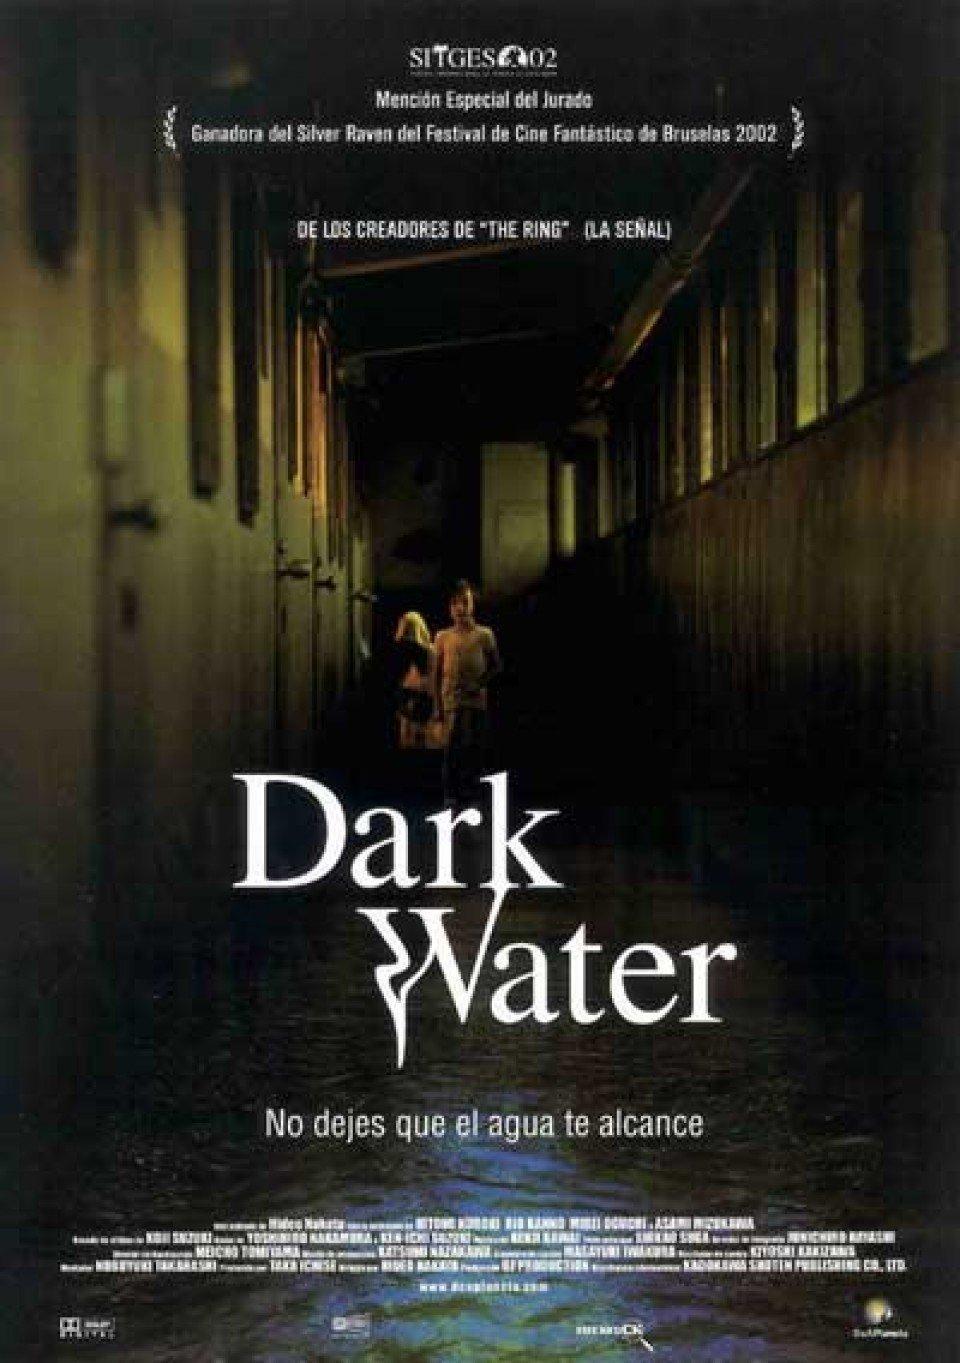 3. Dark Water